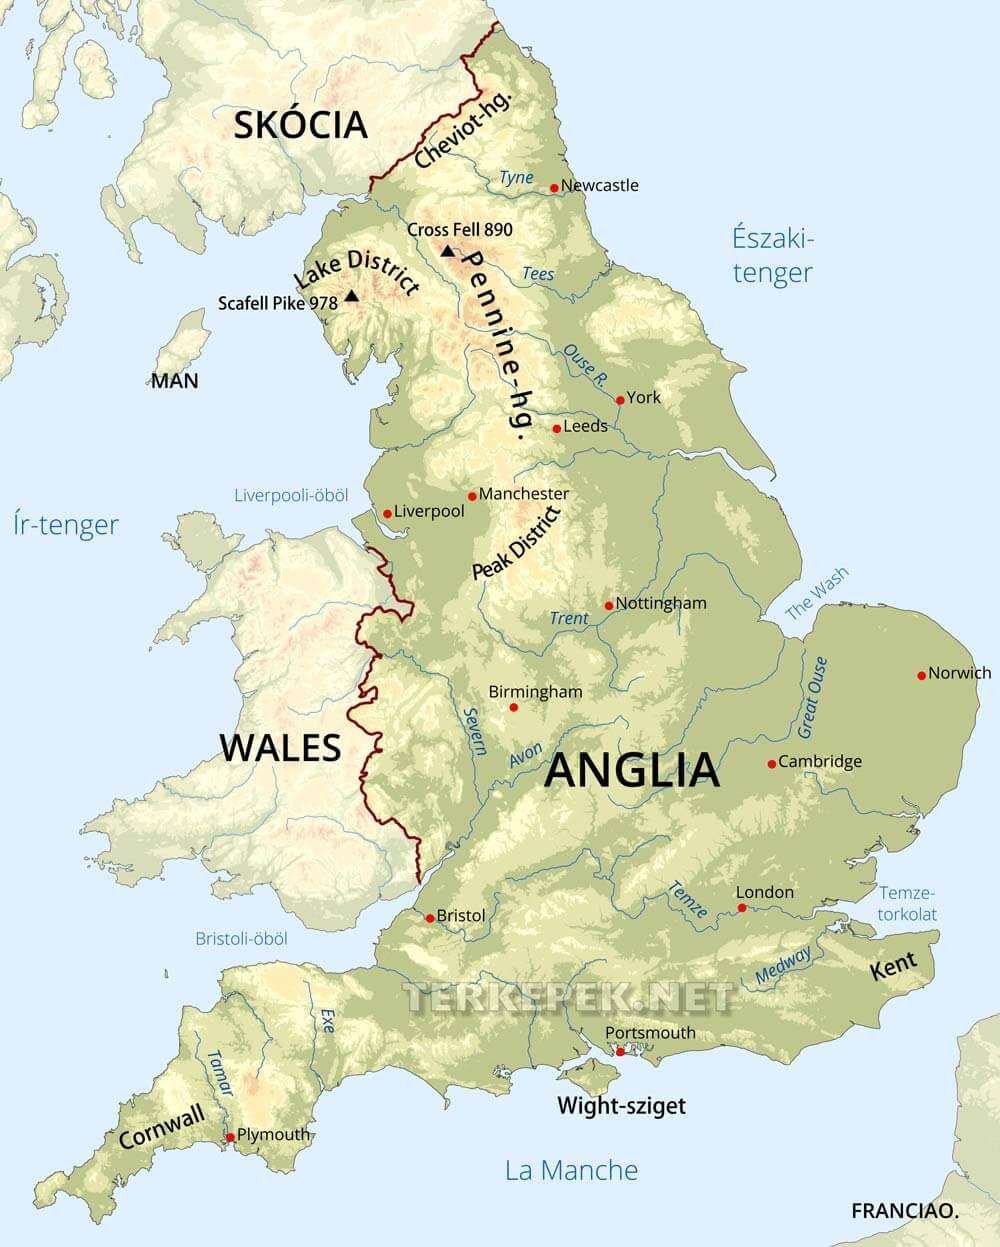 anglia városai térkép Anglia domborzati térképe anglia városai térkép